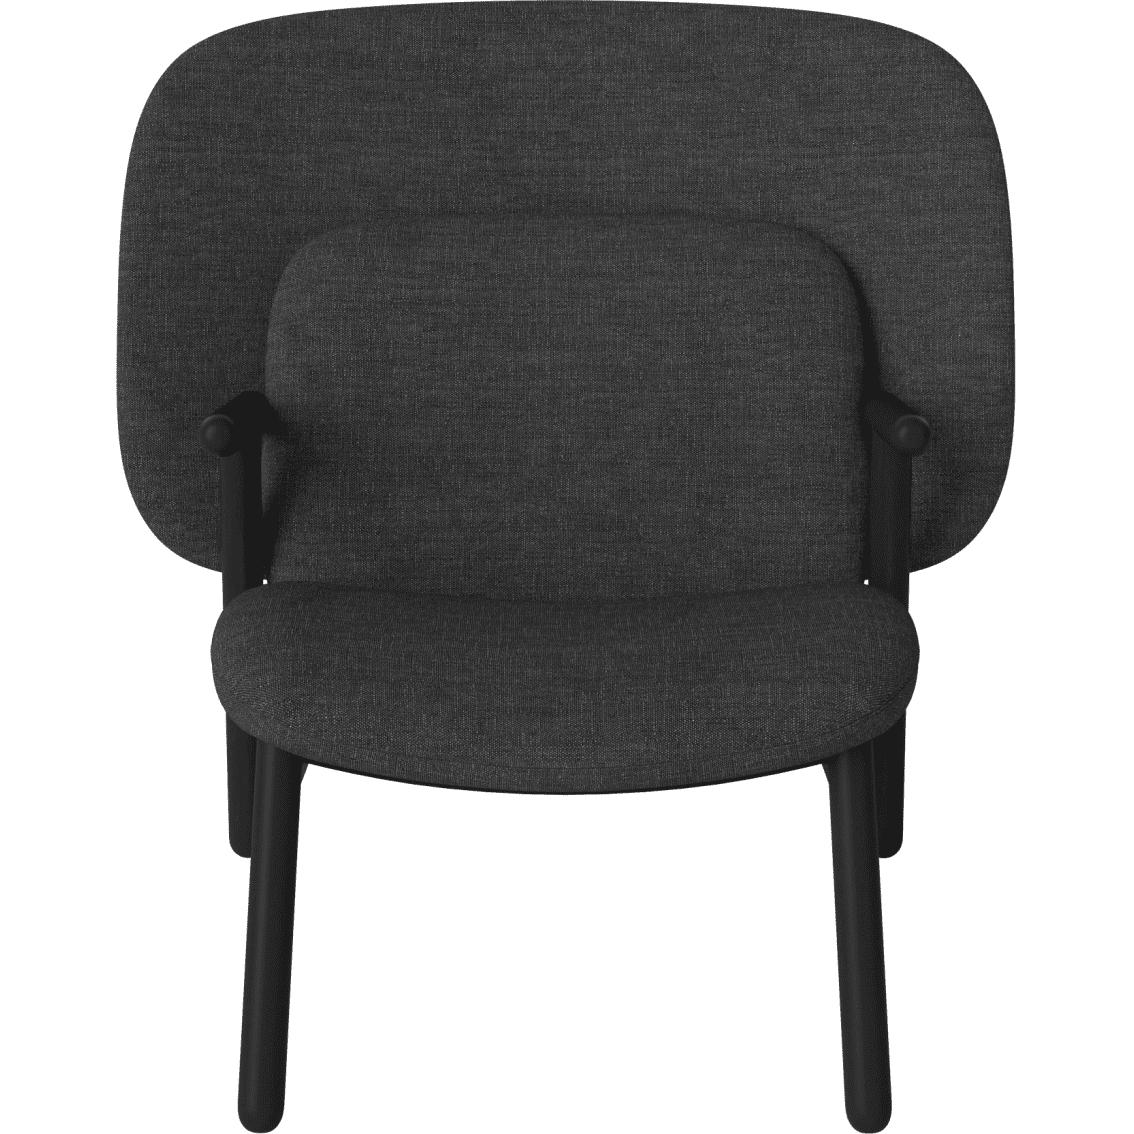 bolia_cosh_armchair_medium_back_karosszék_fotel_seat_living_room_furniture_nappali_butor_oak_tolgy_innoconcept_design_furniture_desing_butor